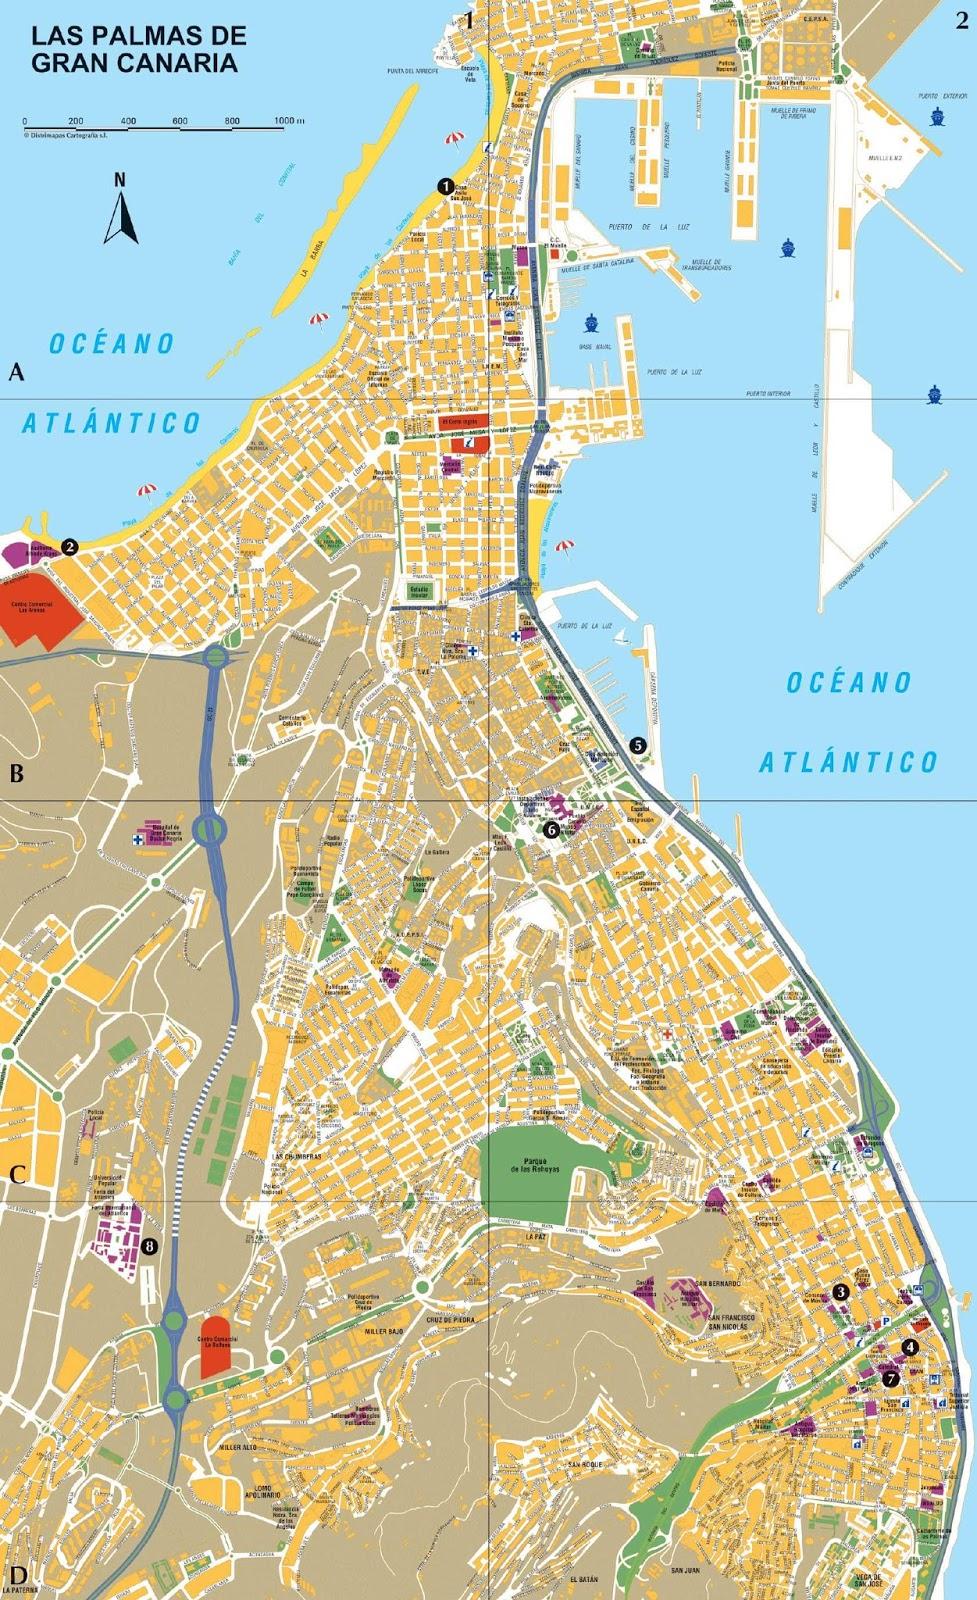 Mapas de las palmas de gran canaria espanha mapasblog for Cristalerias en las palmas de gran canaria